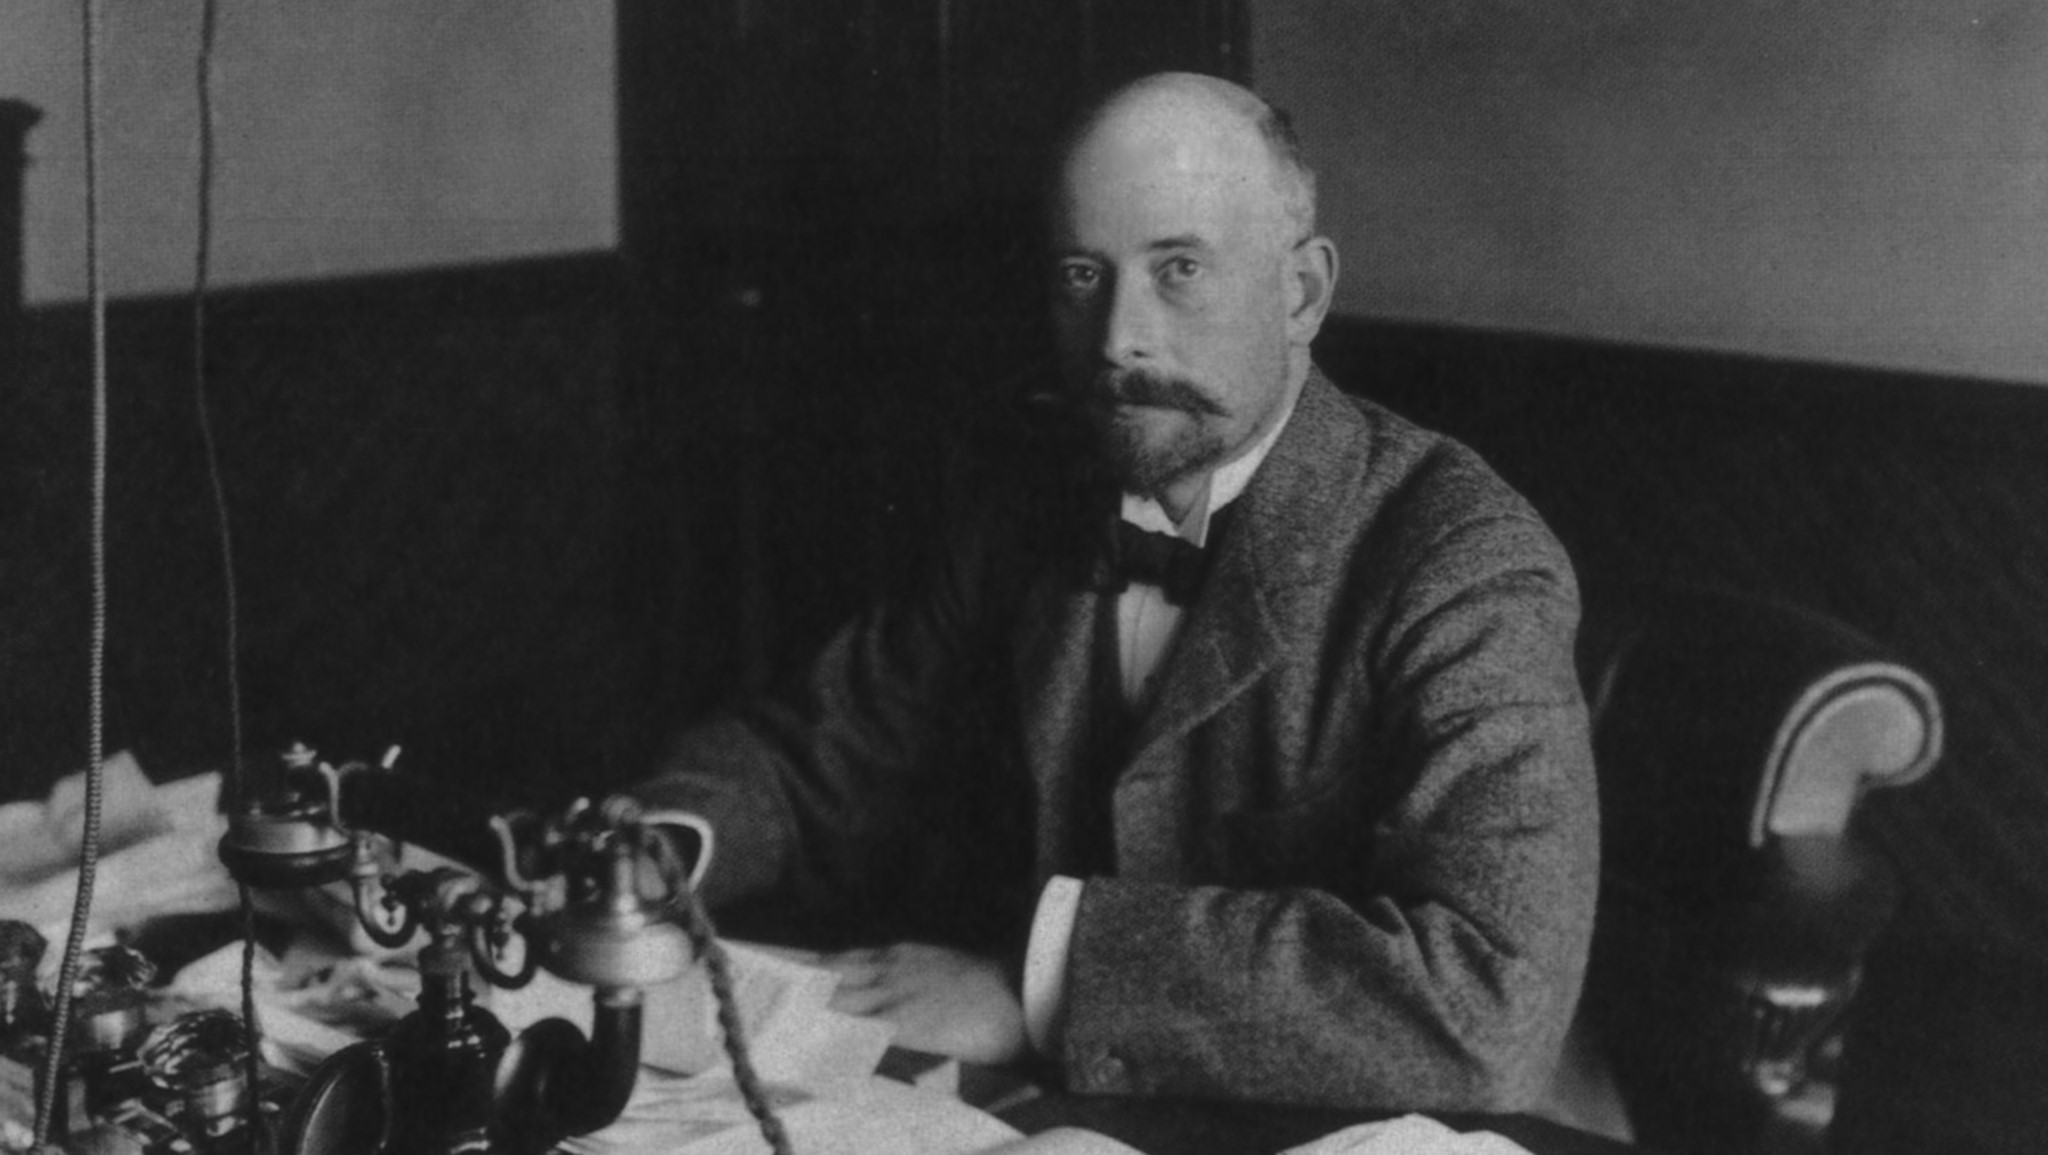 Einar Viggo Schou Founder Of Palsgaard A S And Inventor Of The Modern Food Emulsifier